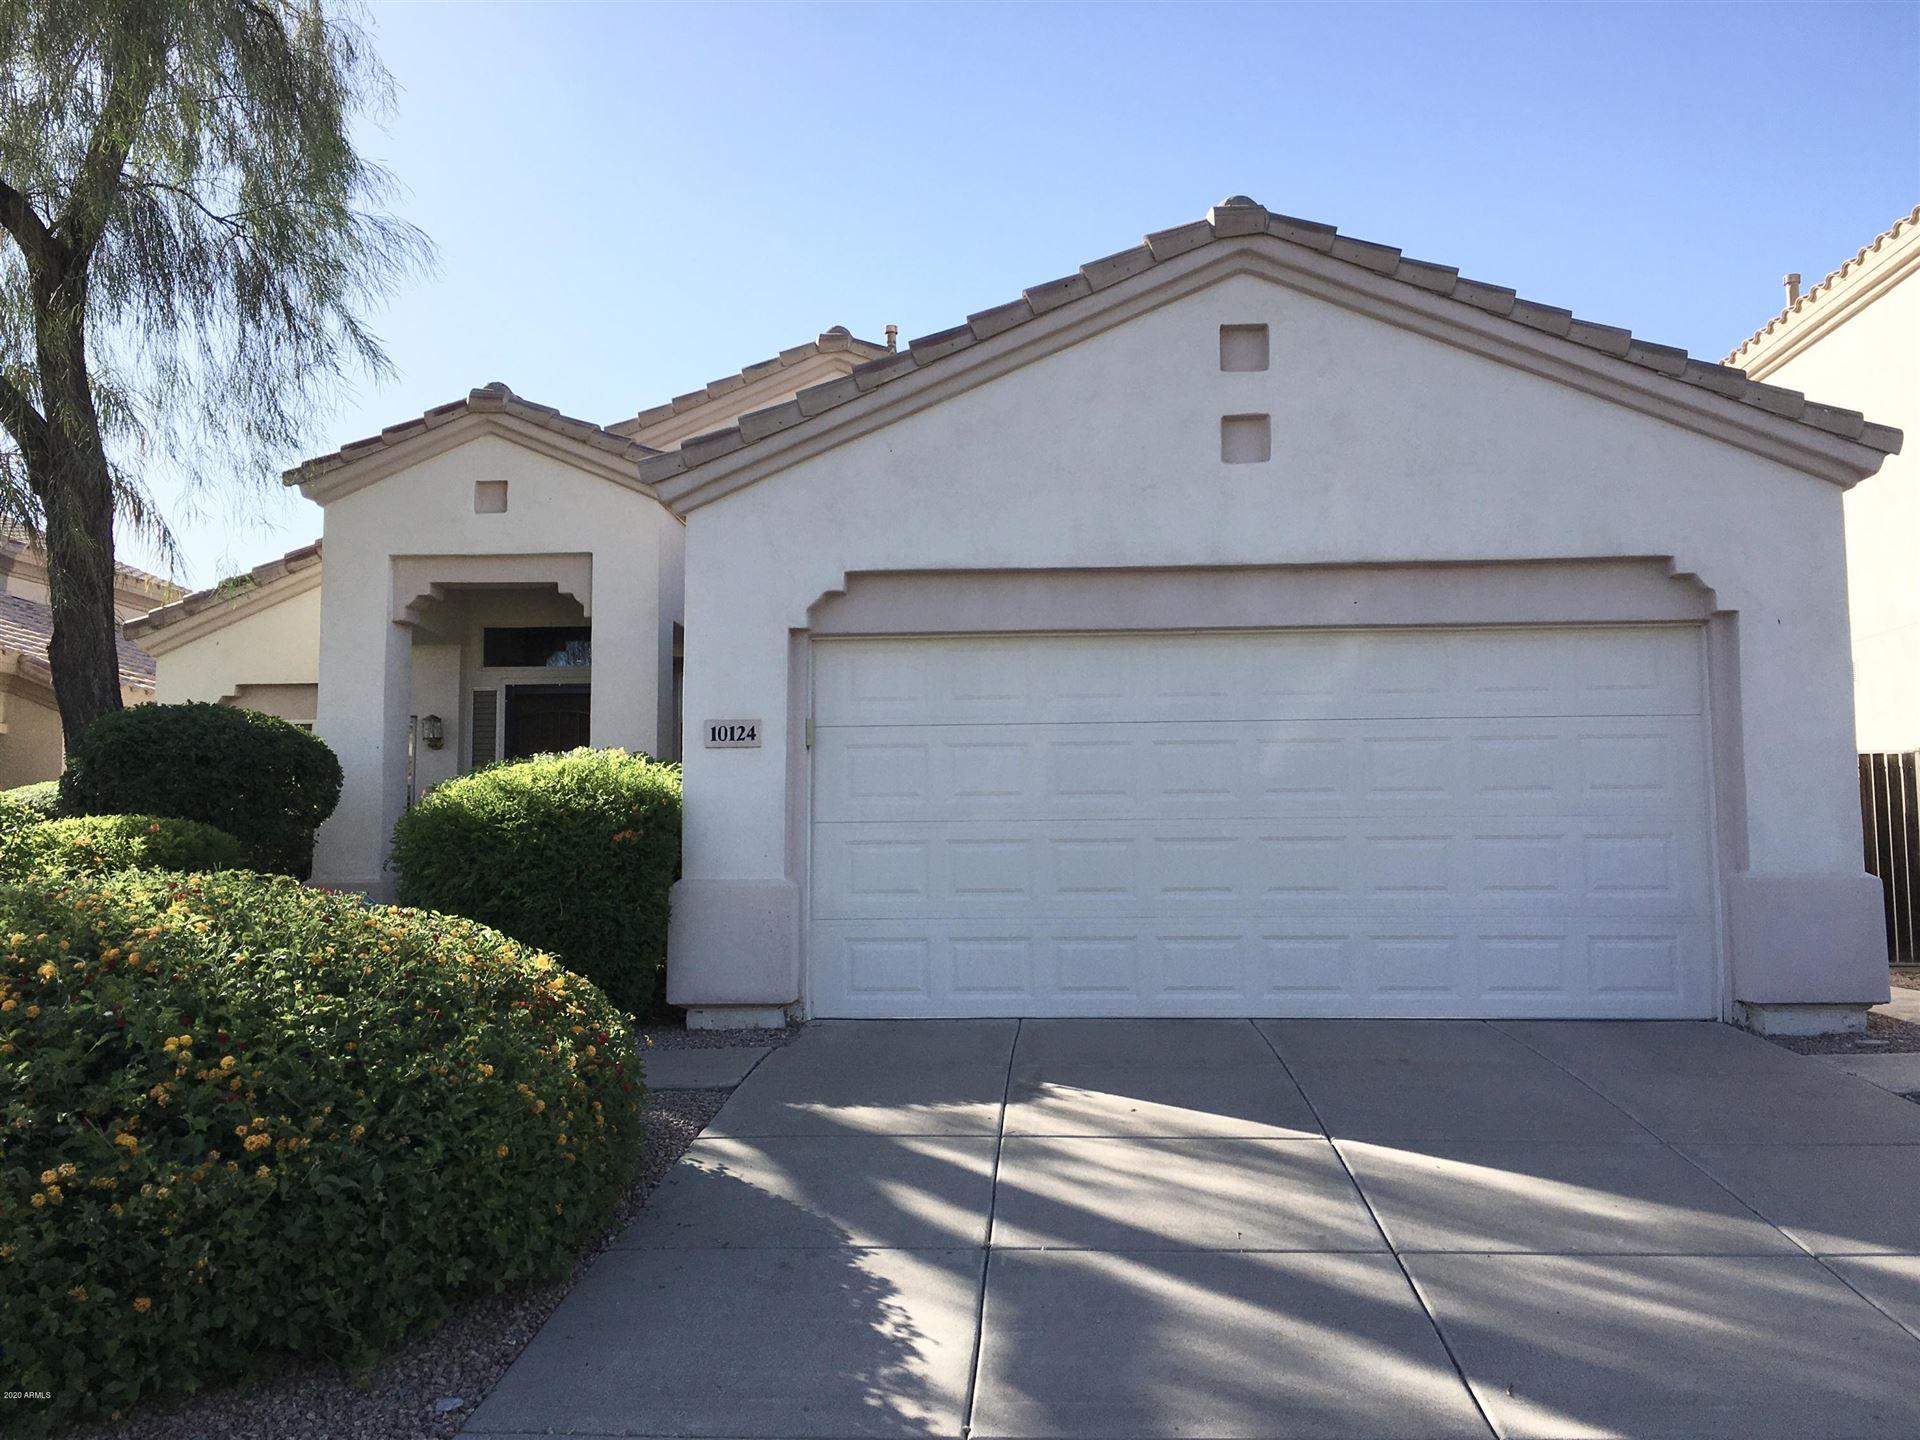 10124 E FLORIADE Drive, Scottsdale, AZ 85260 - #: 6093133